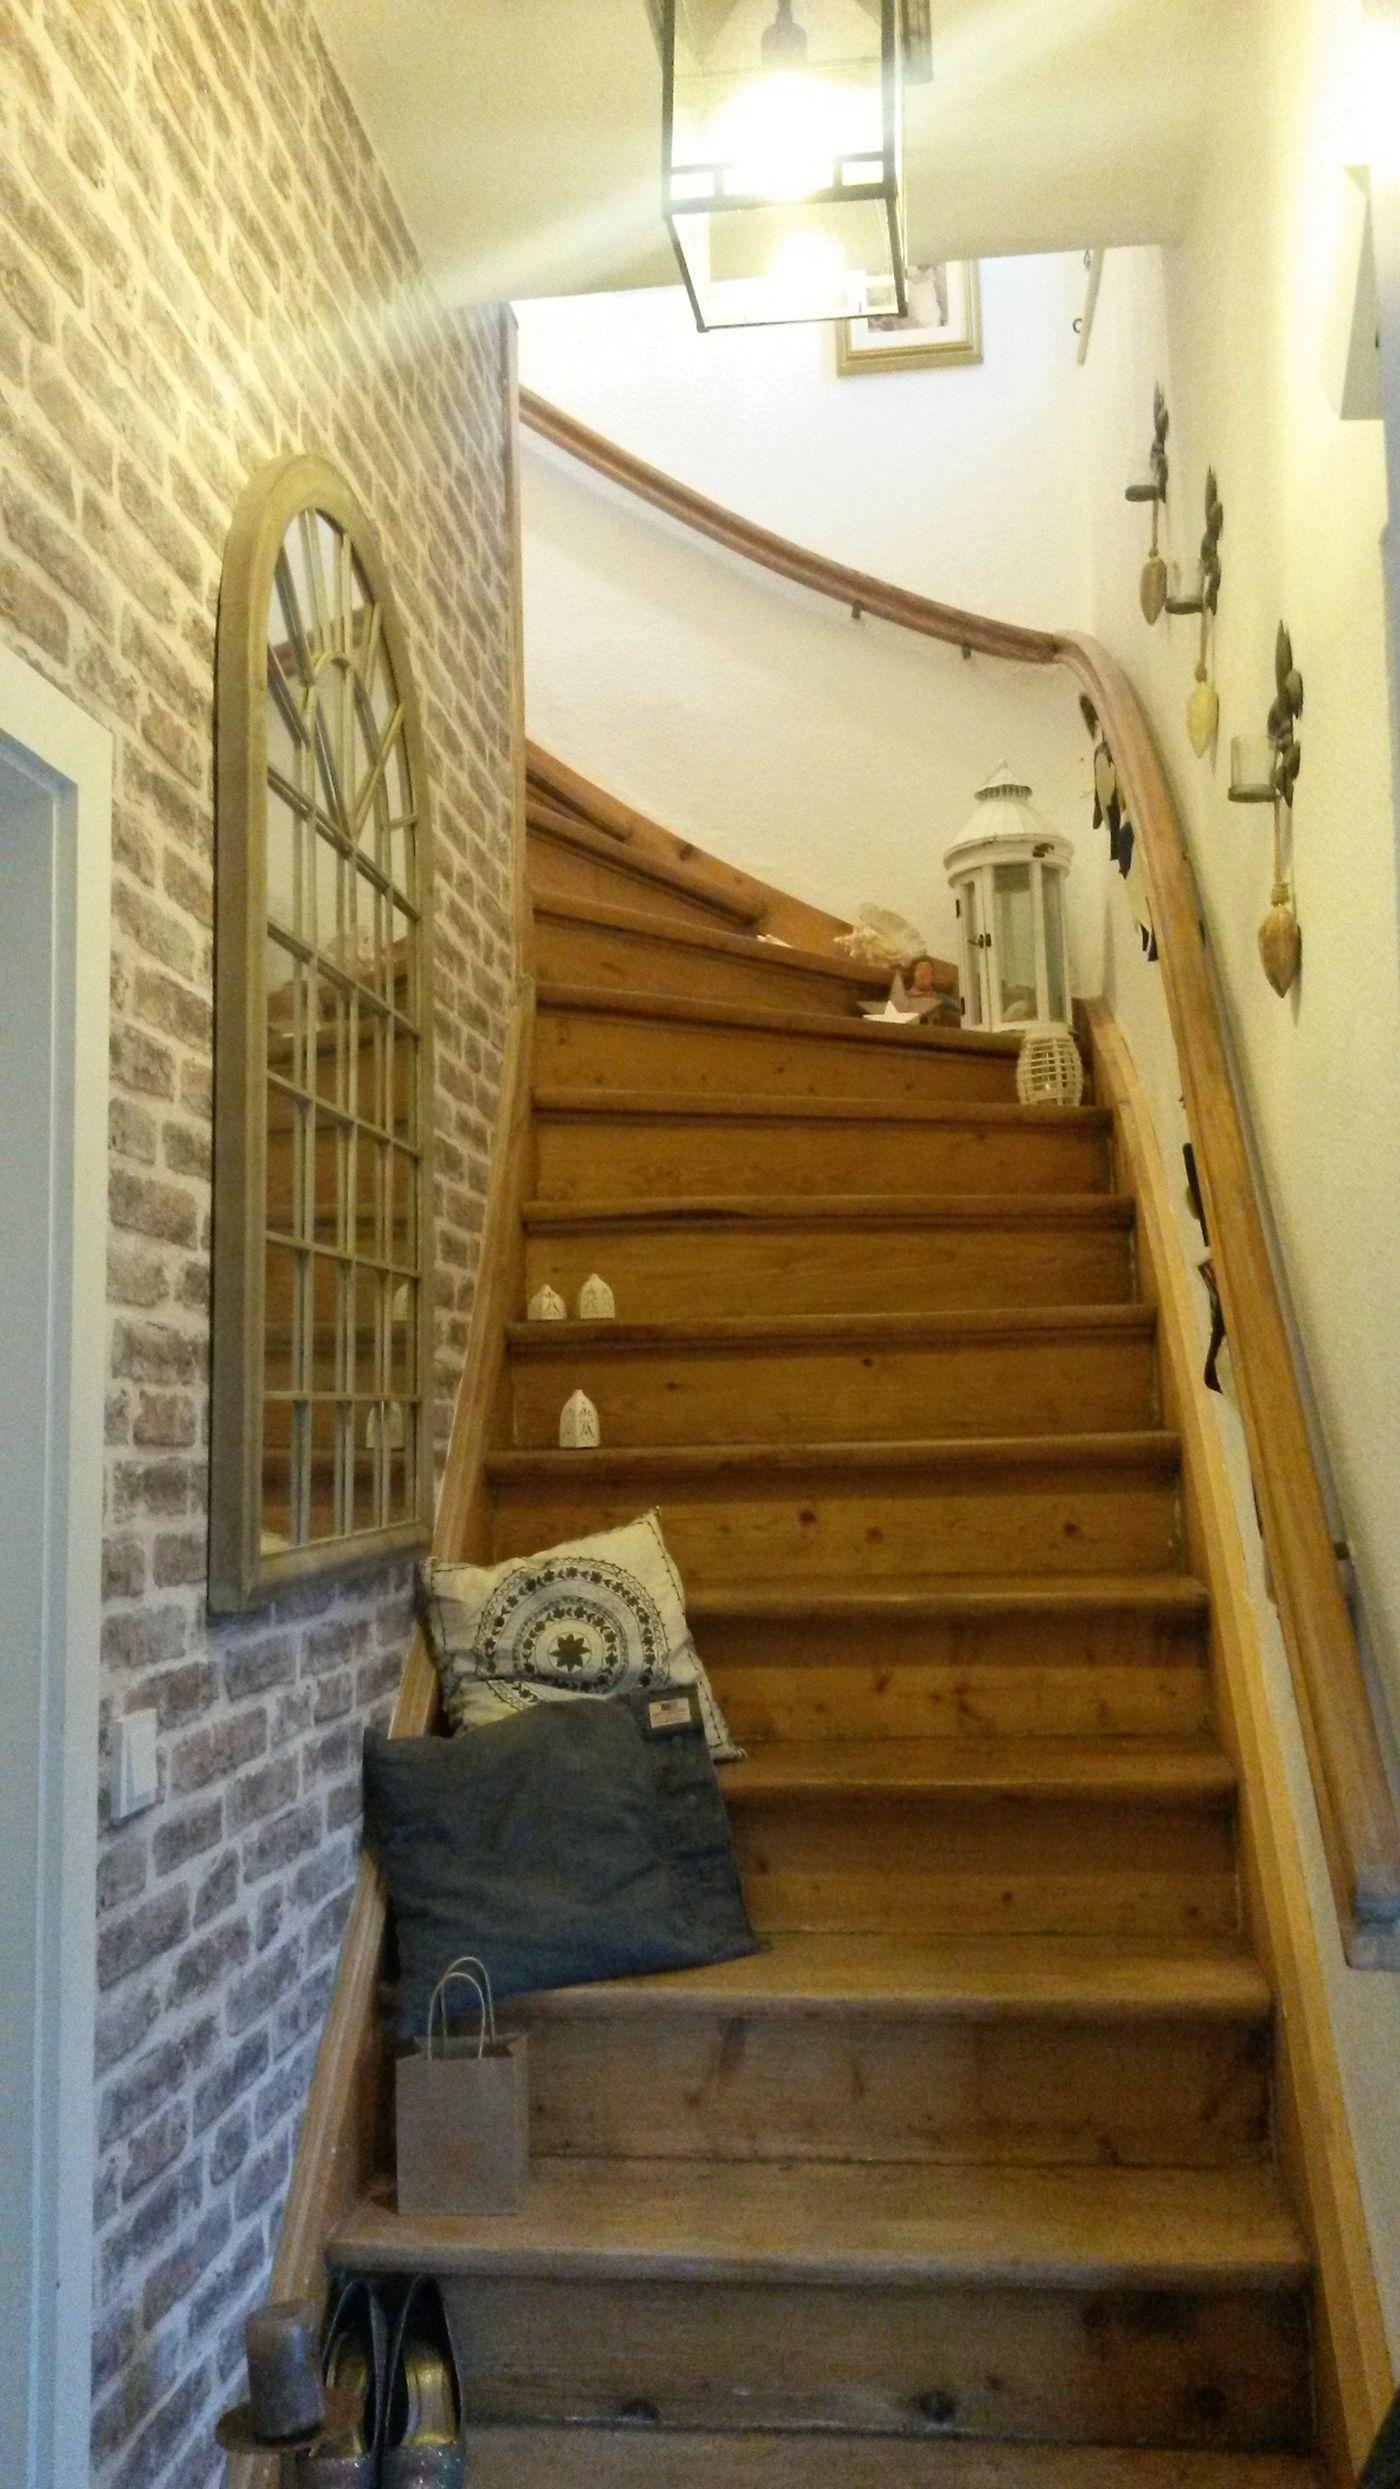 treppenhaus gestalten ideen geraumiges treppenhaus gestalten wande bilder ideen home geraumiges. Black Bedroom Furniture Sets. Home Design Ideas